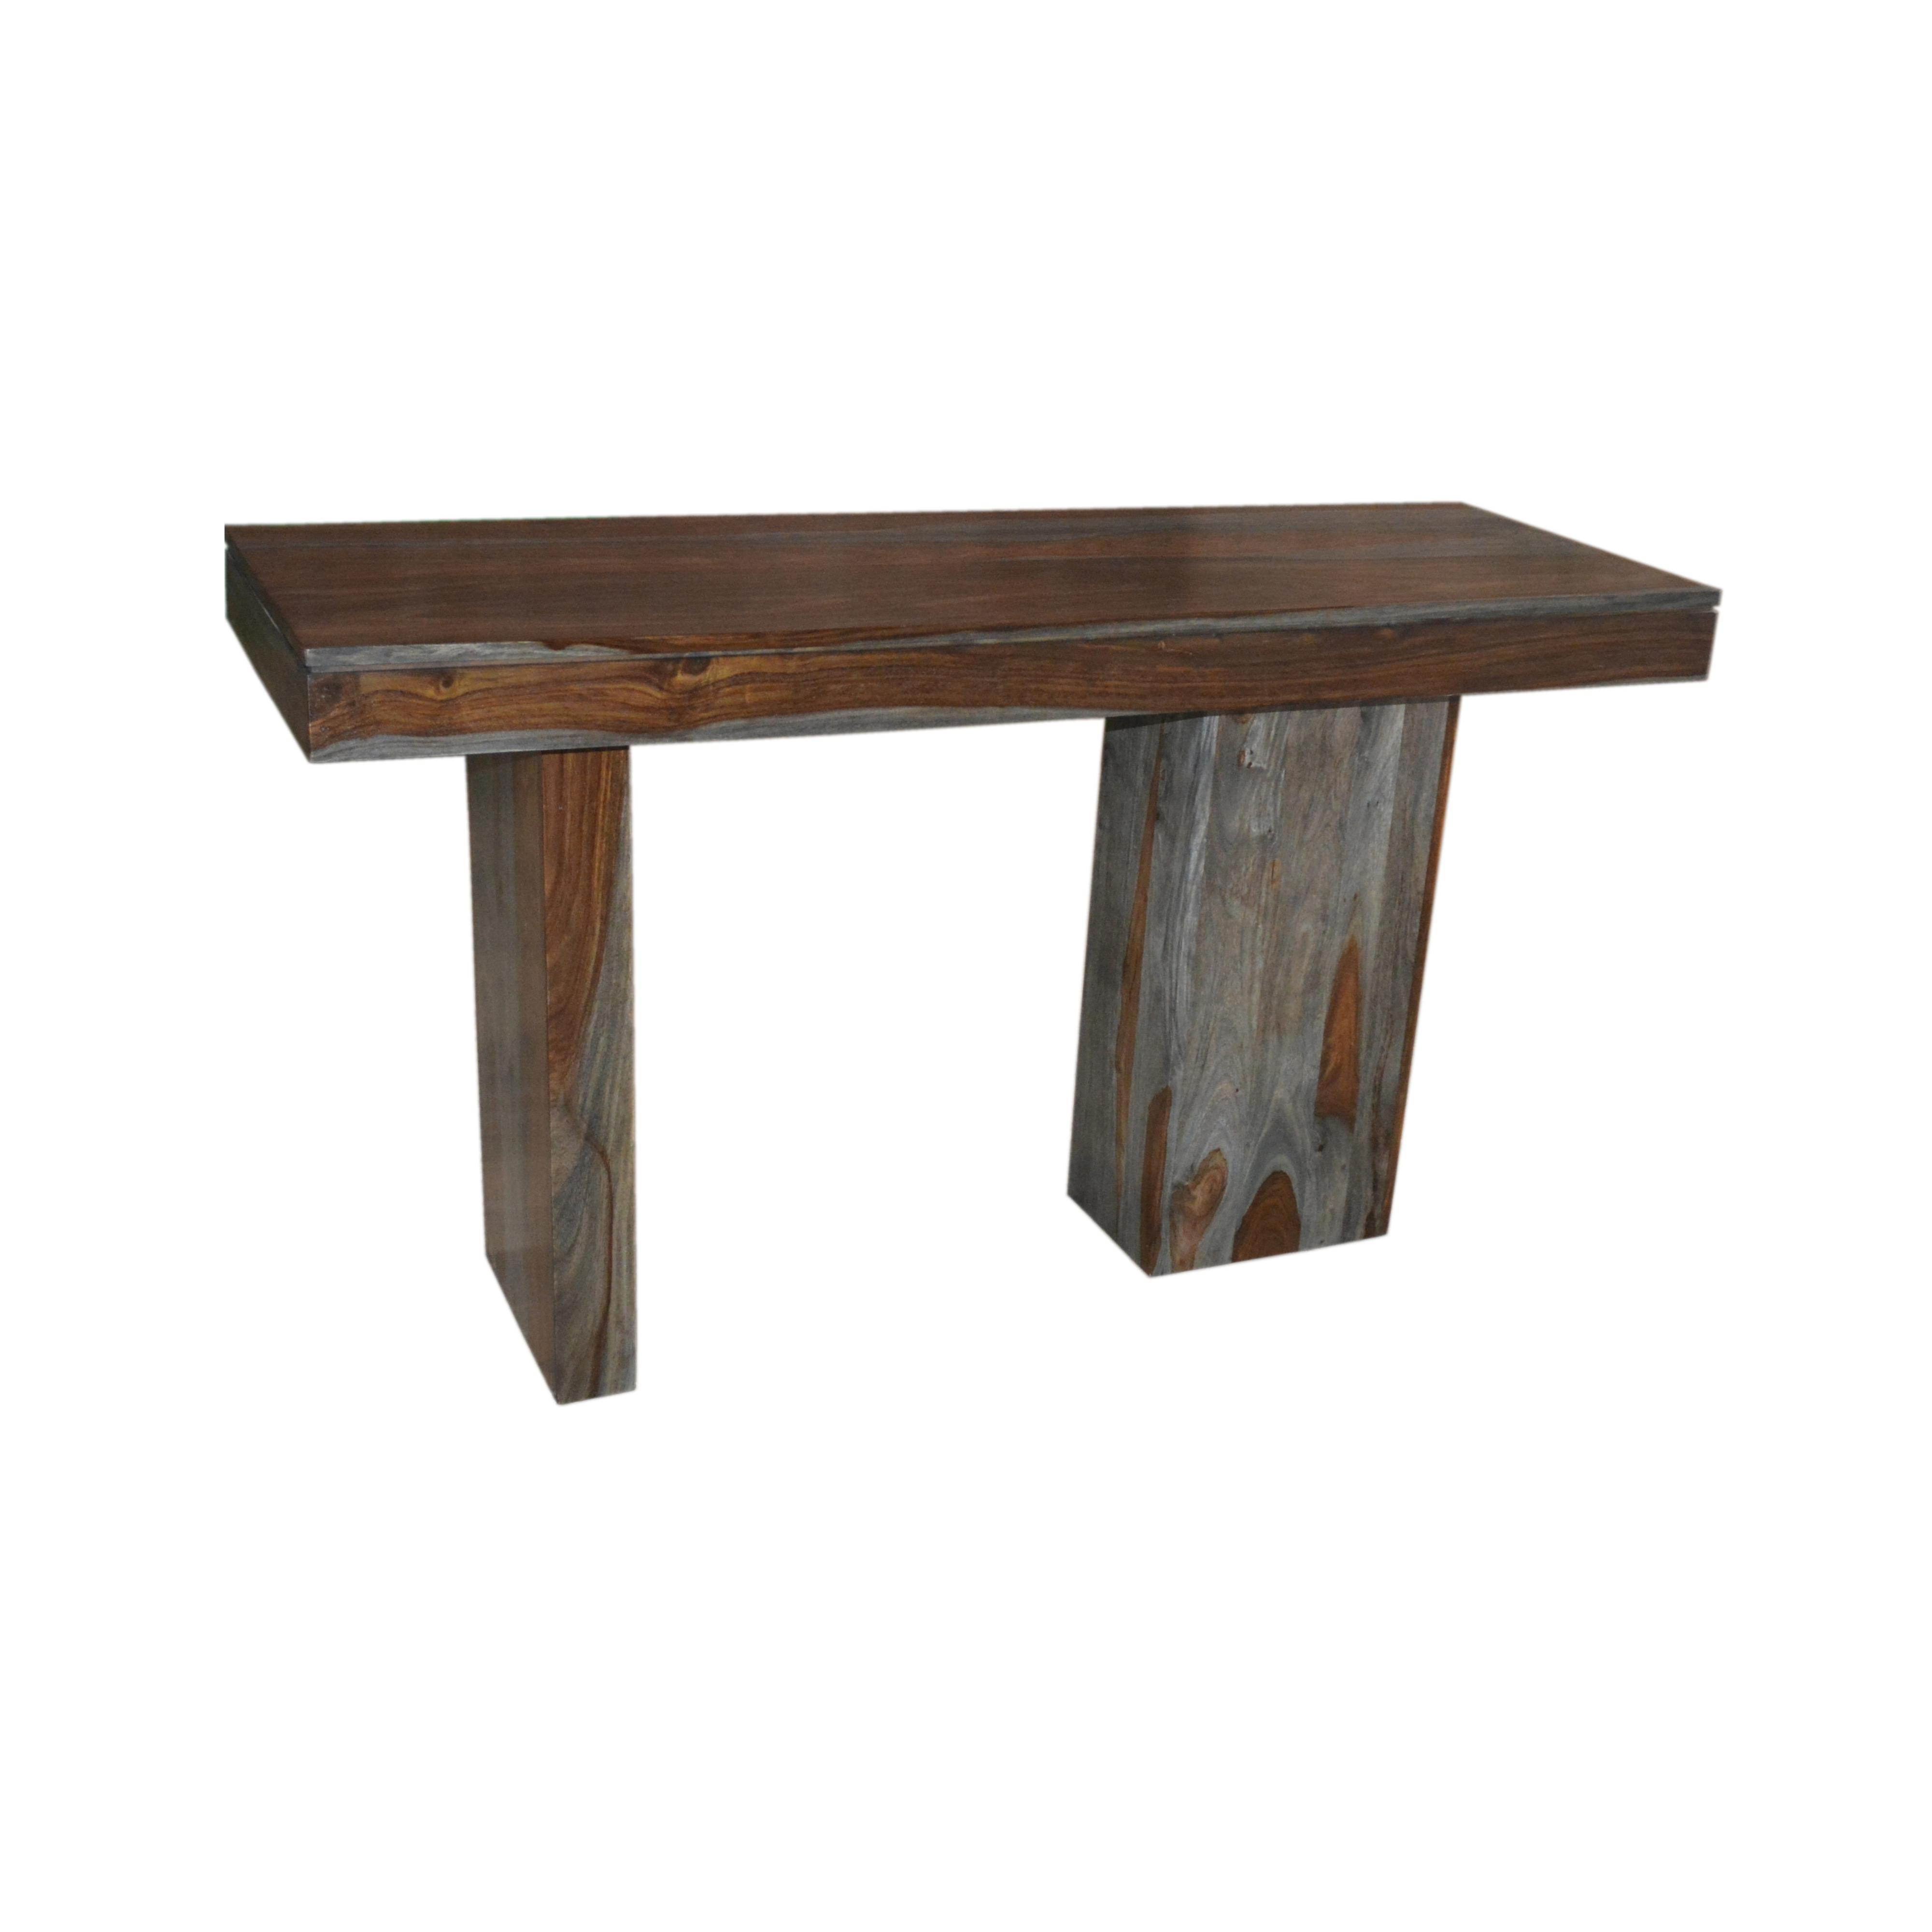 Coast to coast imports grayson console table boulevard for Sofa table rules